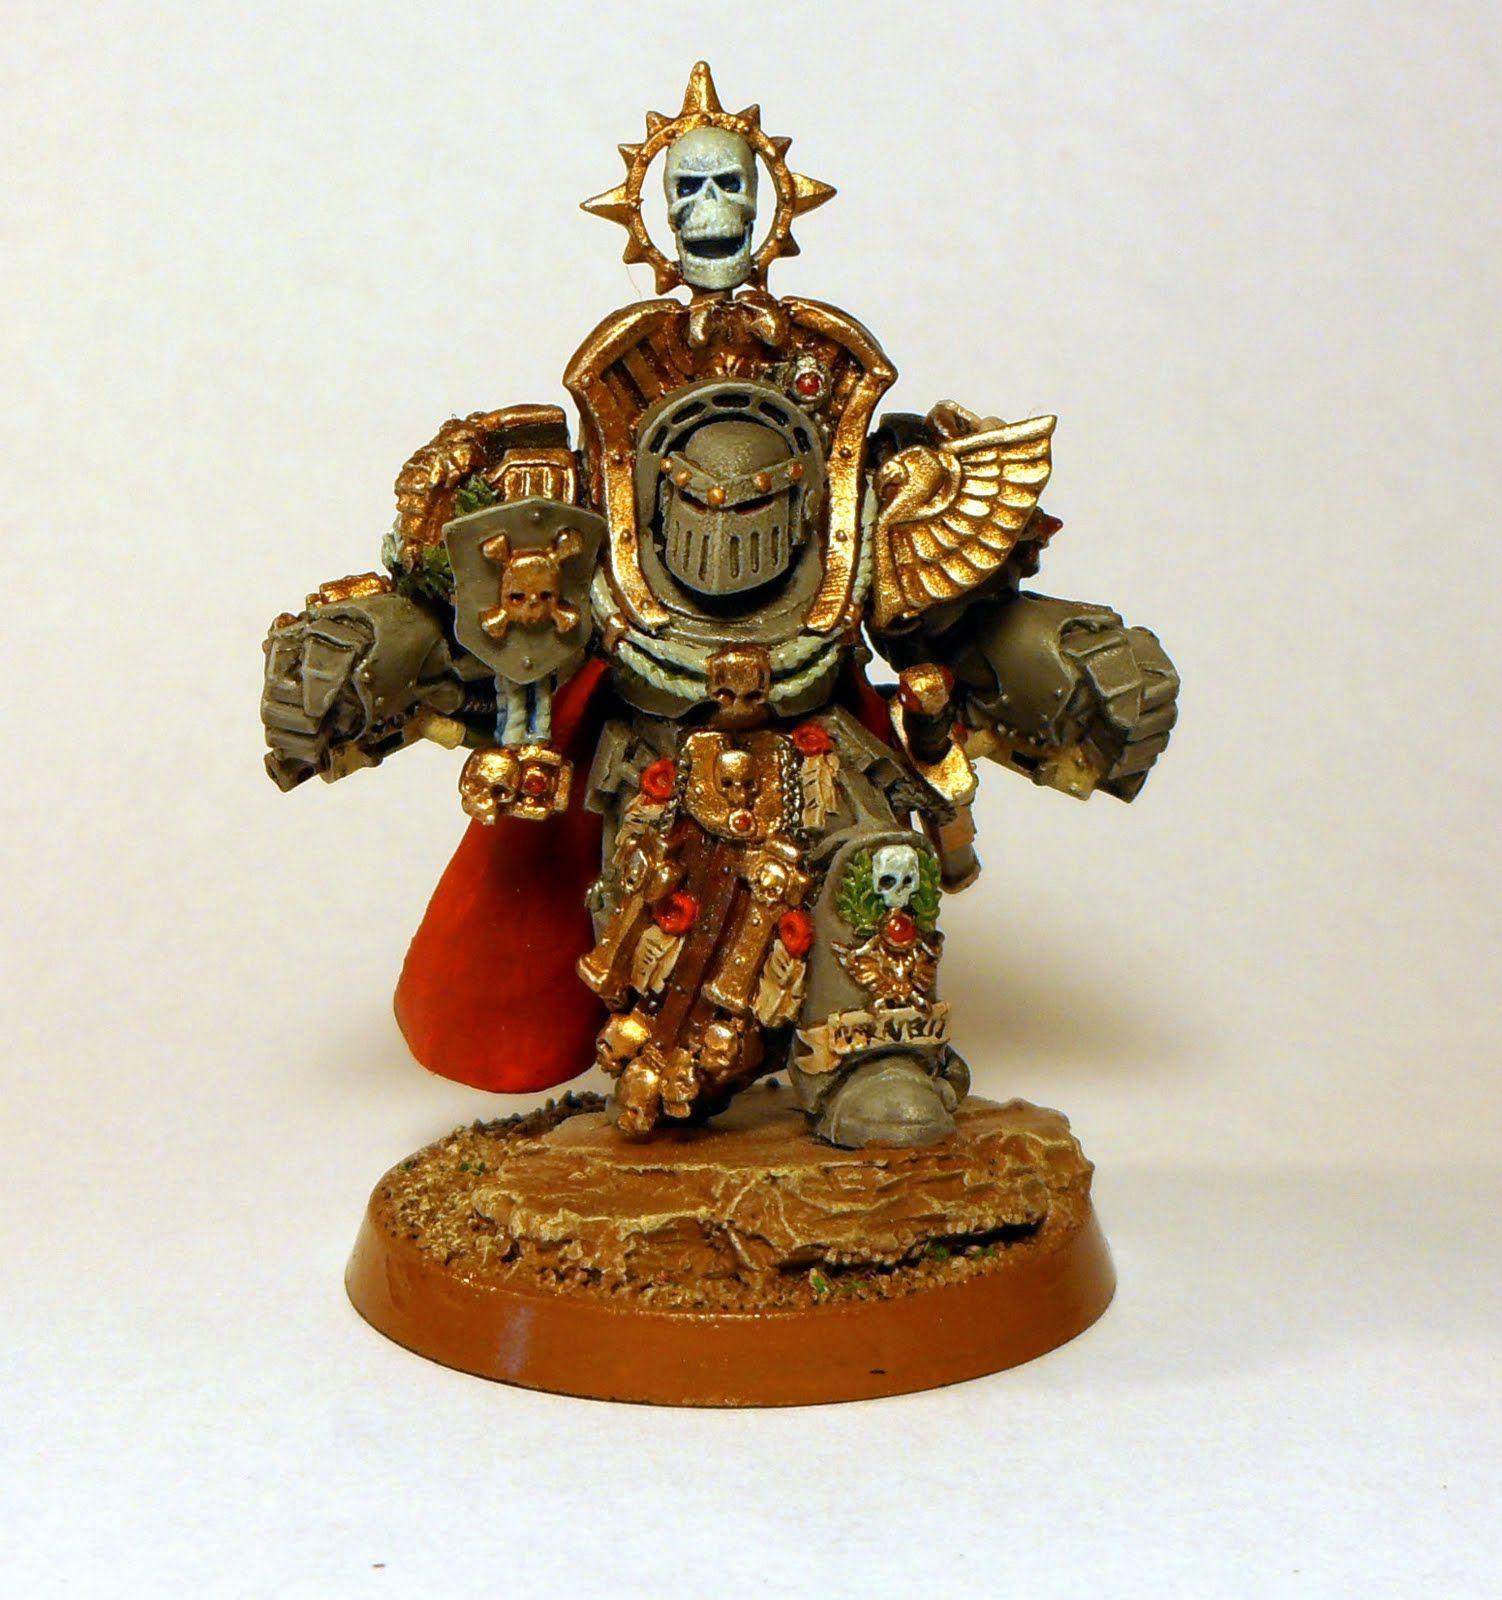 Power Armor, Miniatures, Sculpture